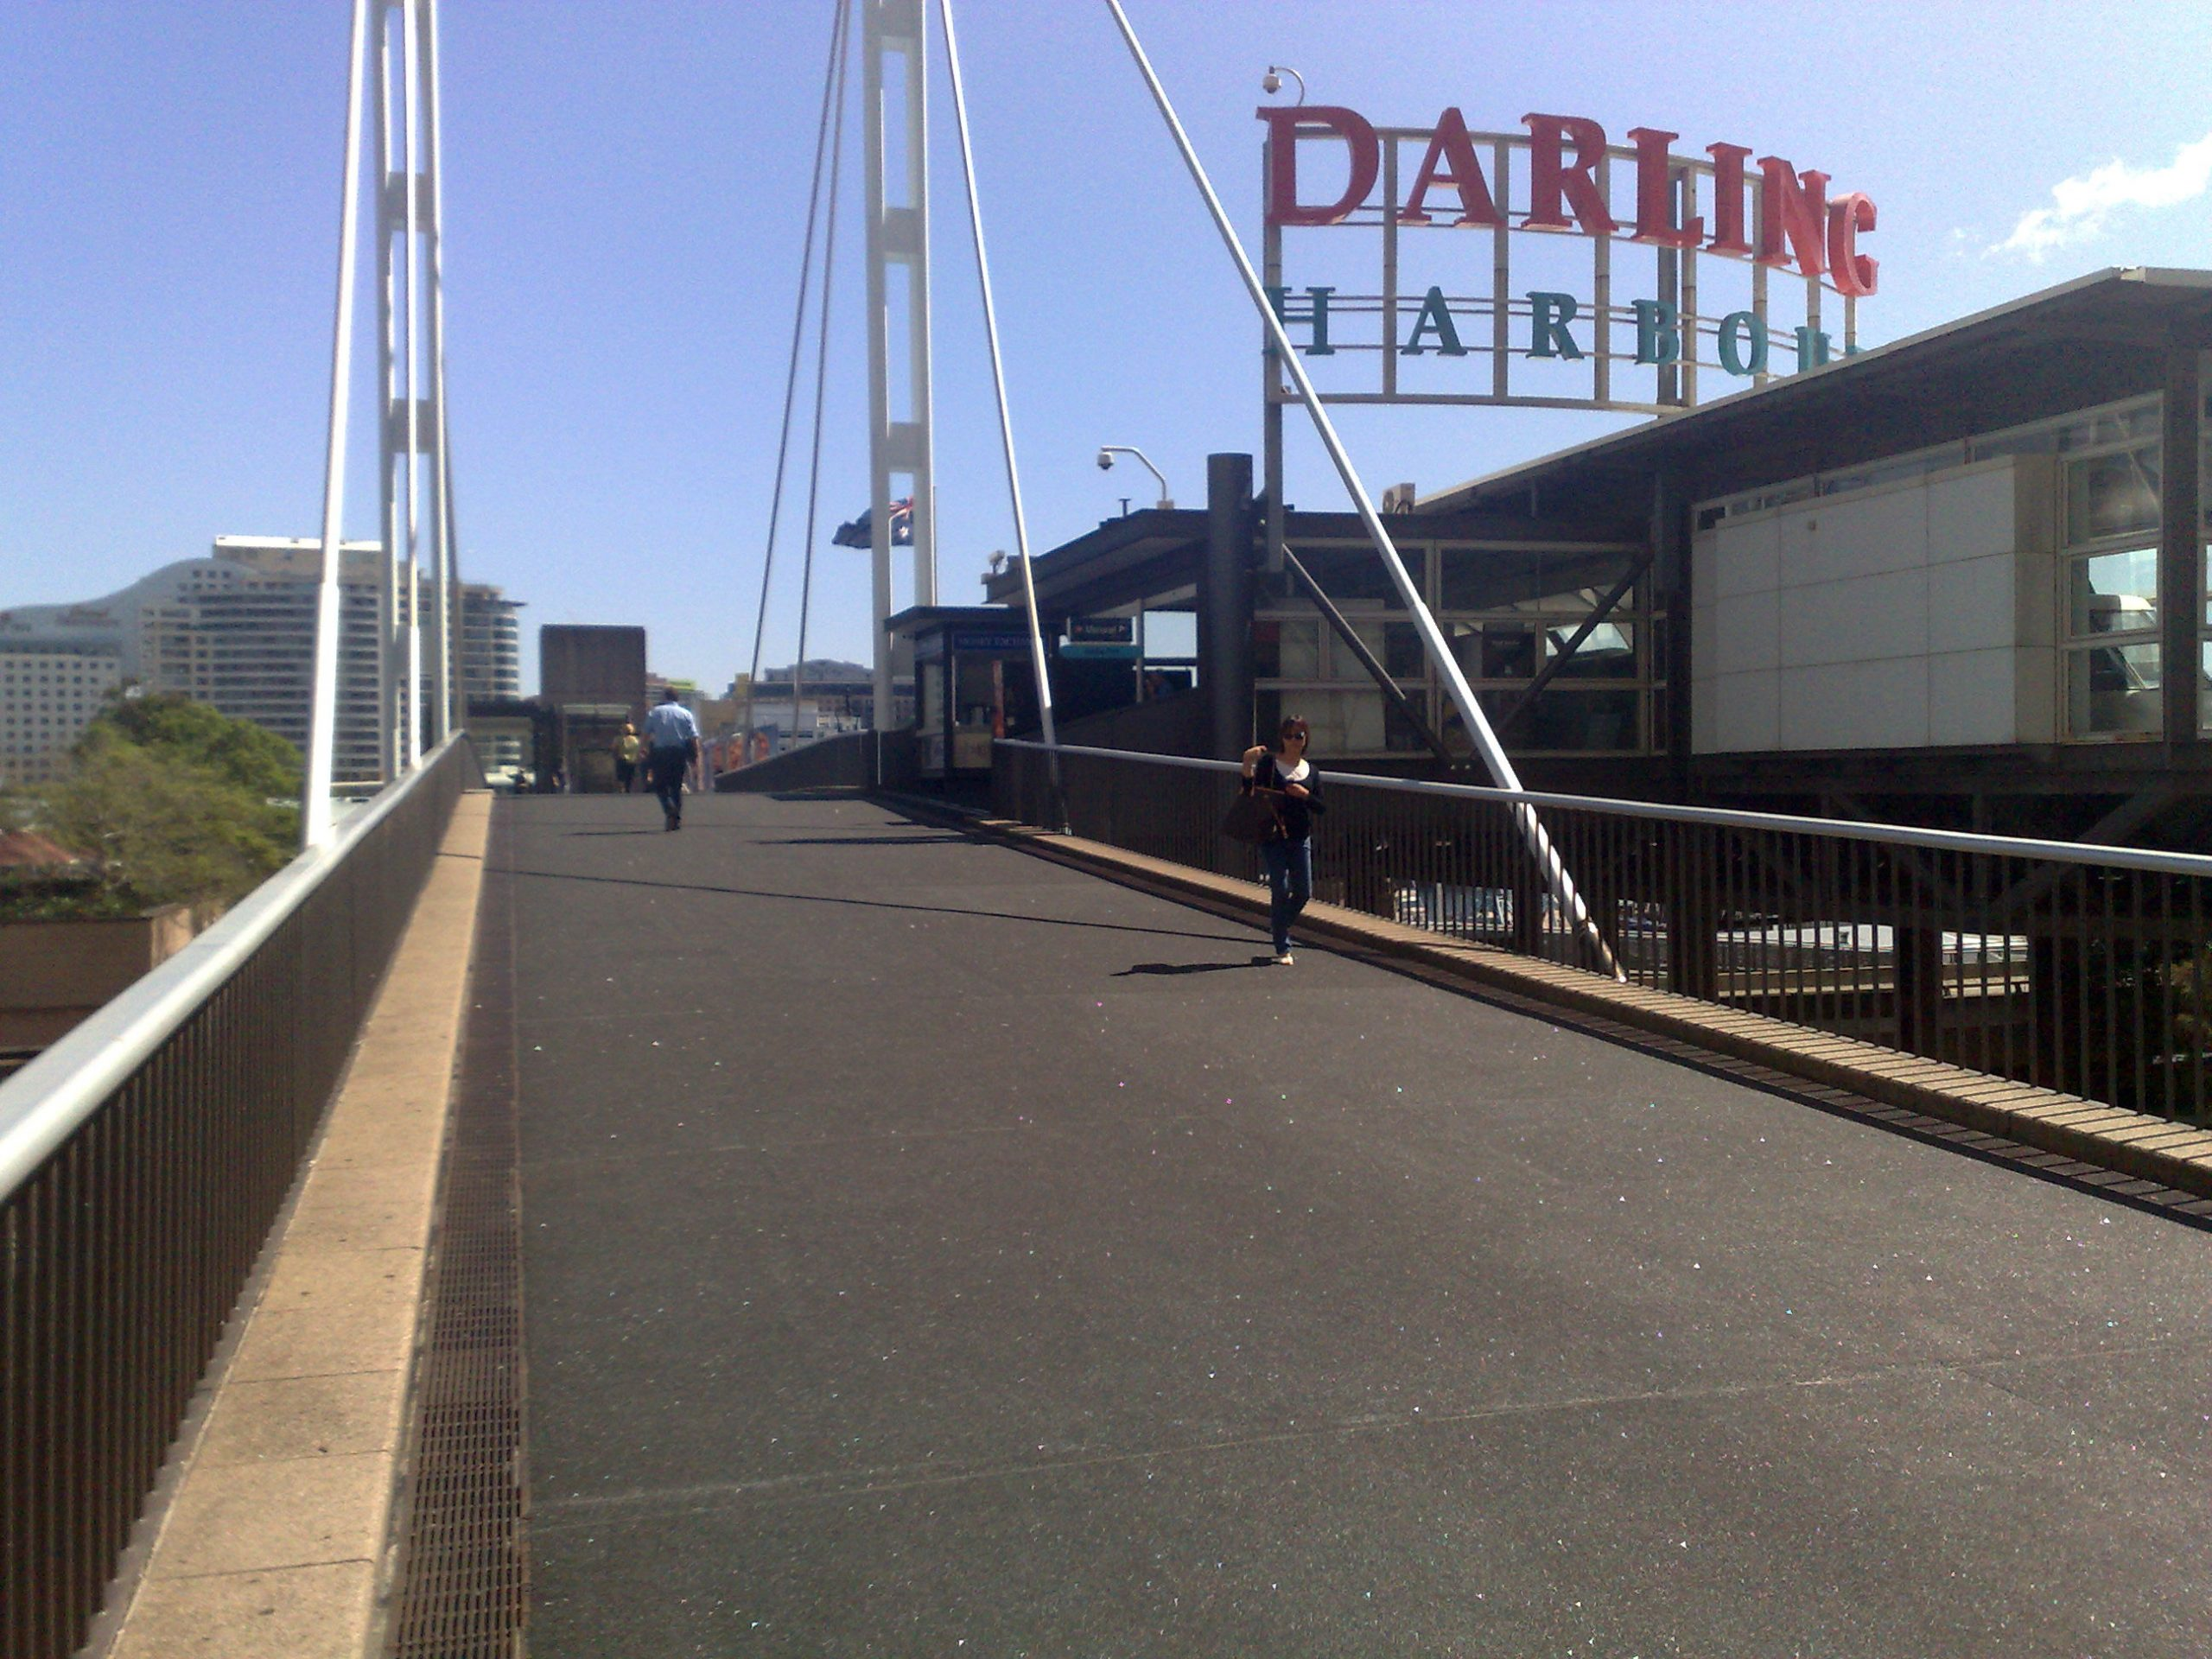 Darling Park (5)